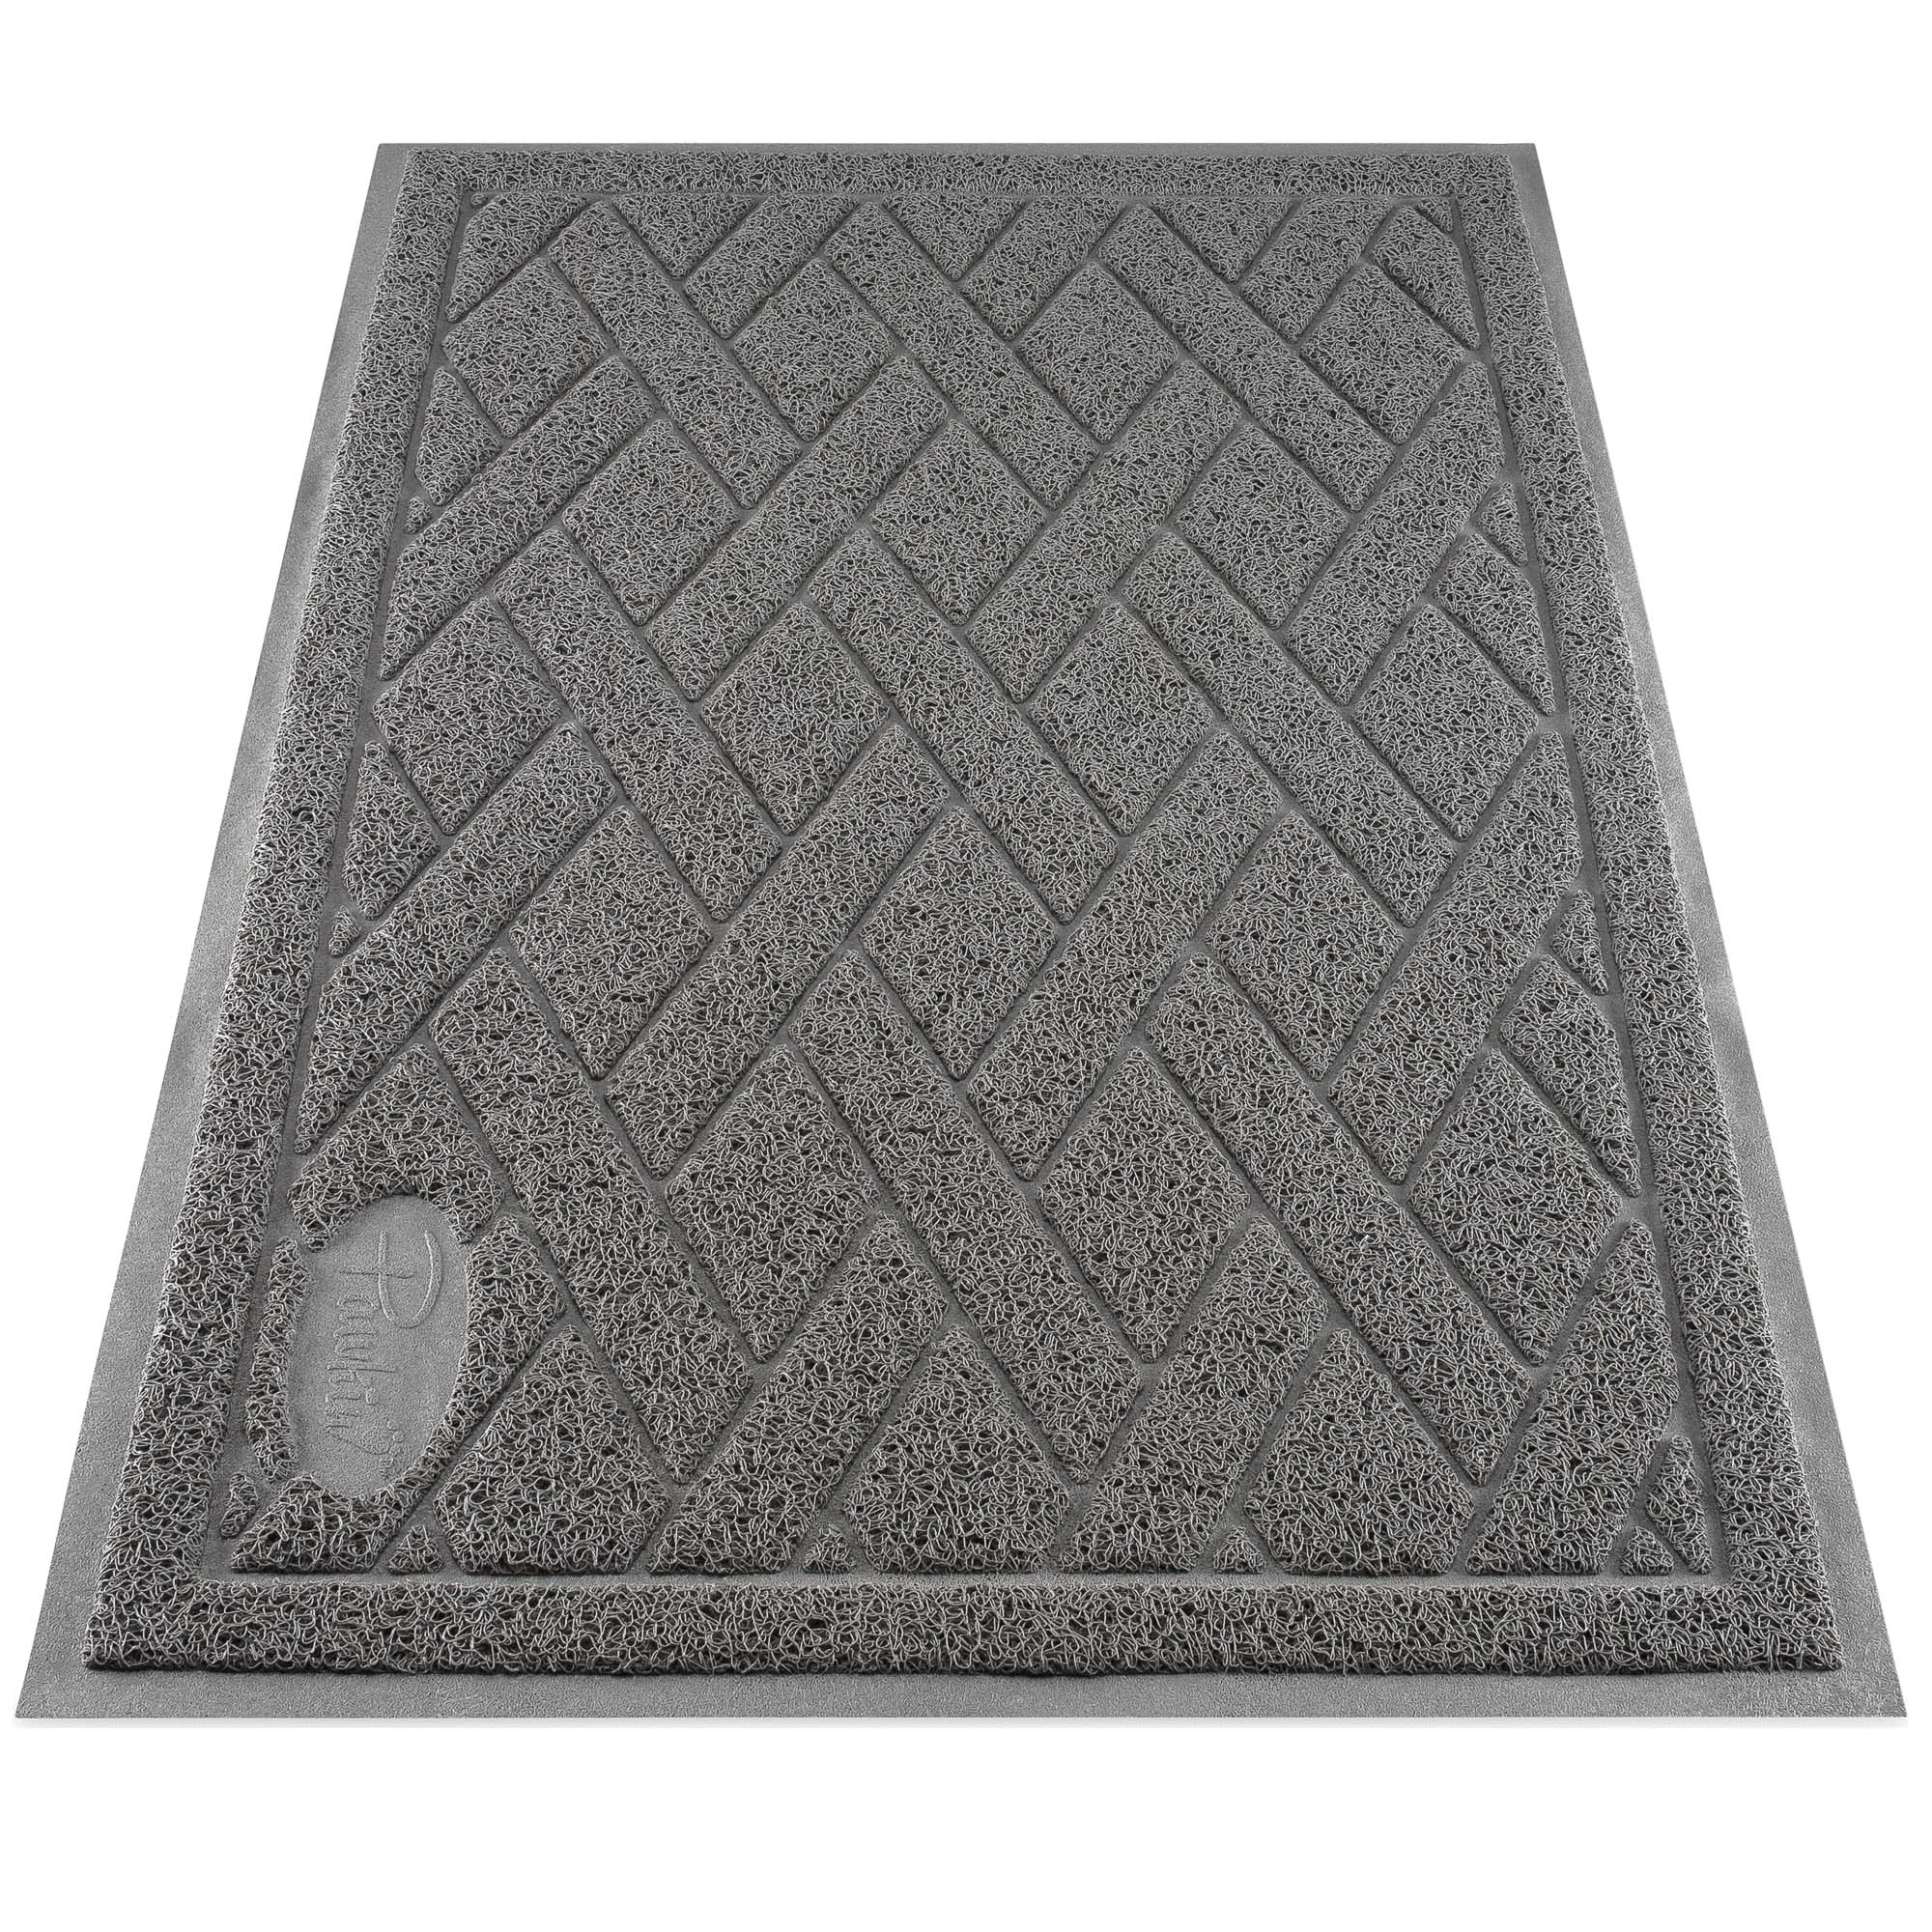 shop center cat mat product phresh shape en trapper litter mats petcostore so petco paw